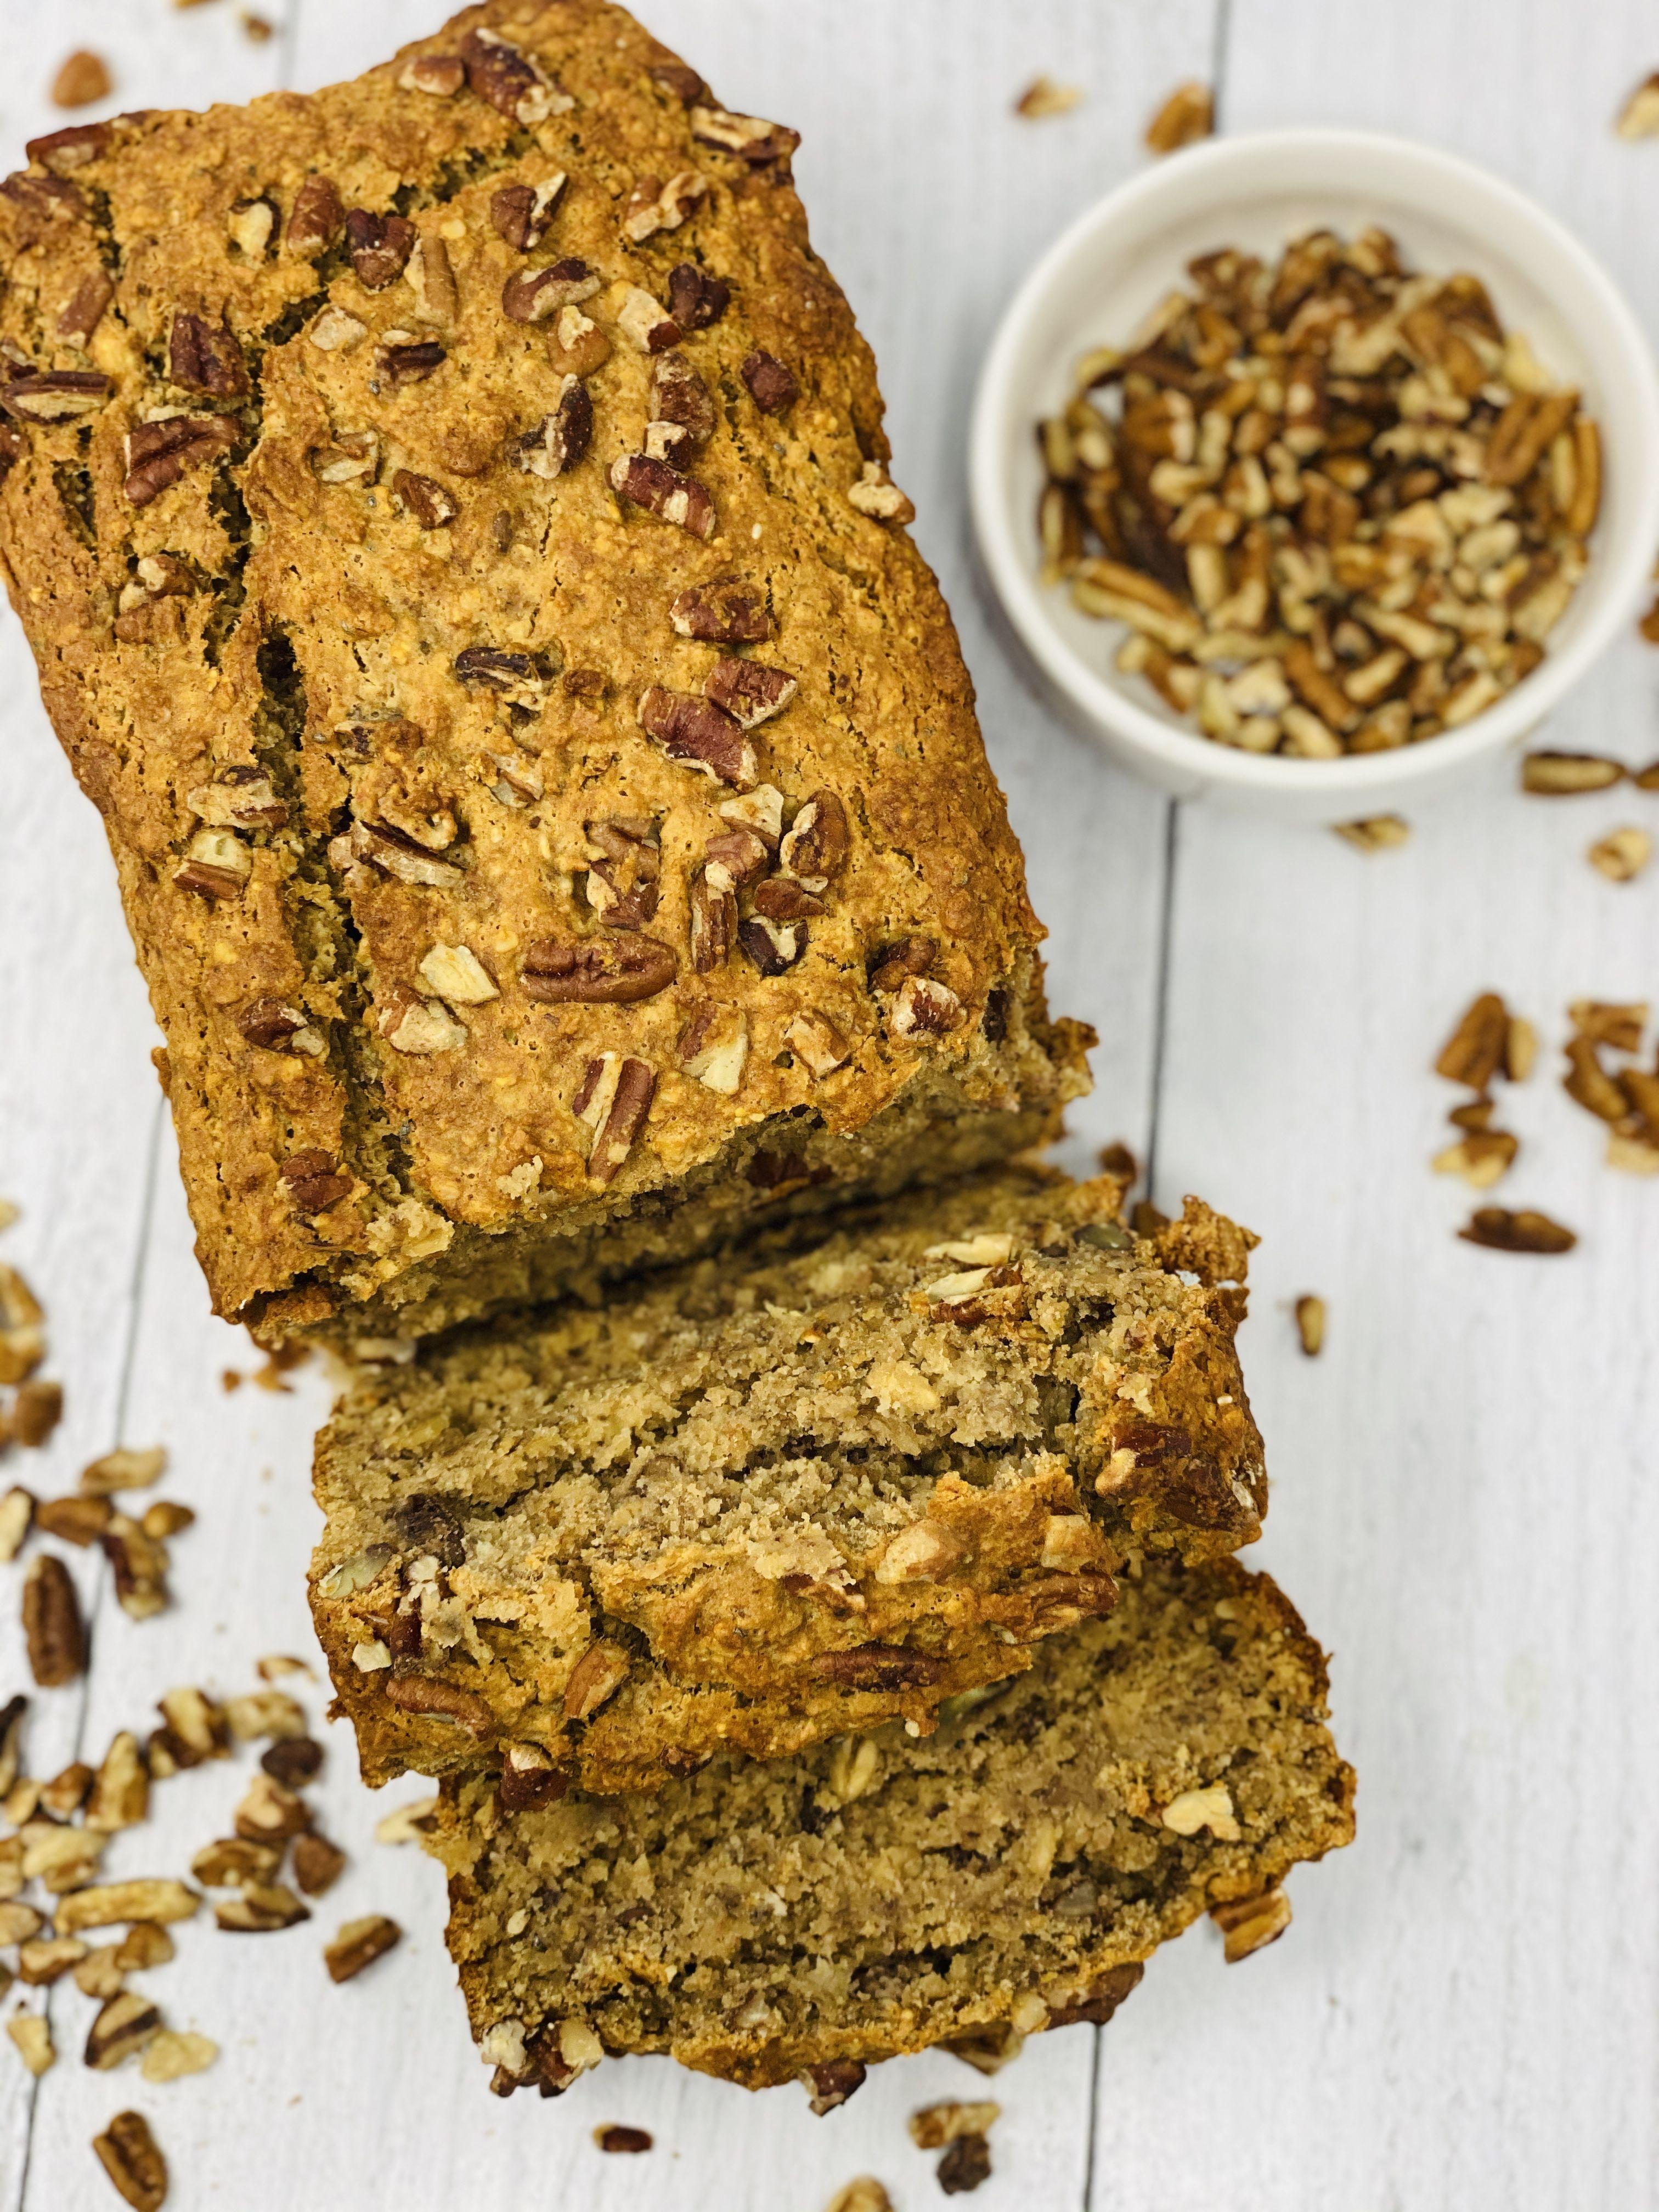 Cinnamon toast crunch banana bread in 2020 cinnamon